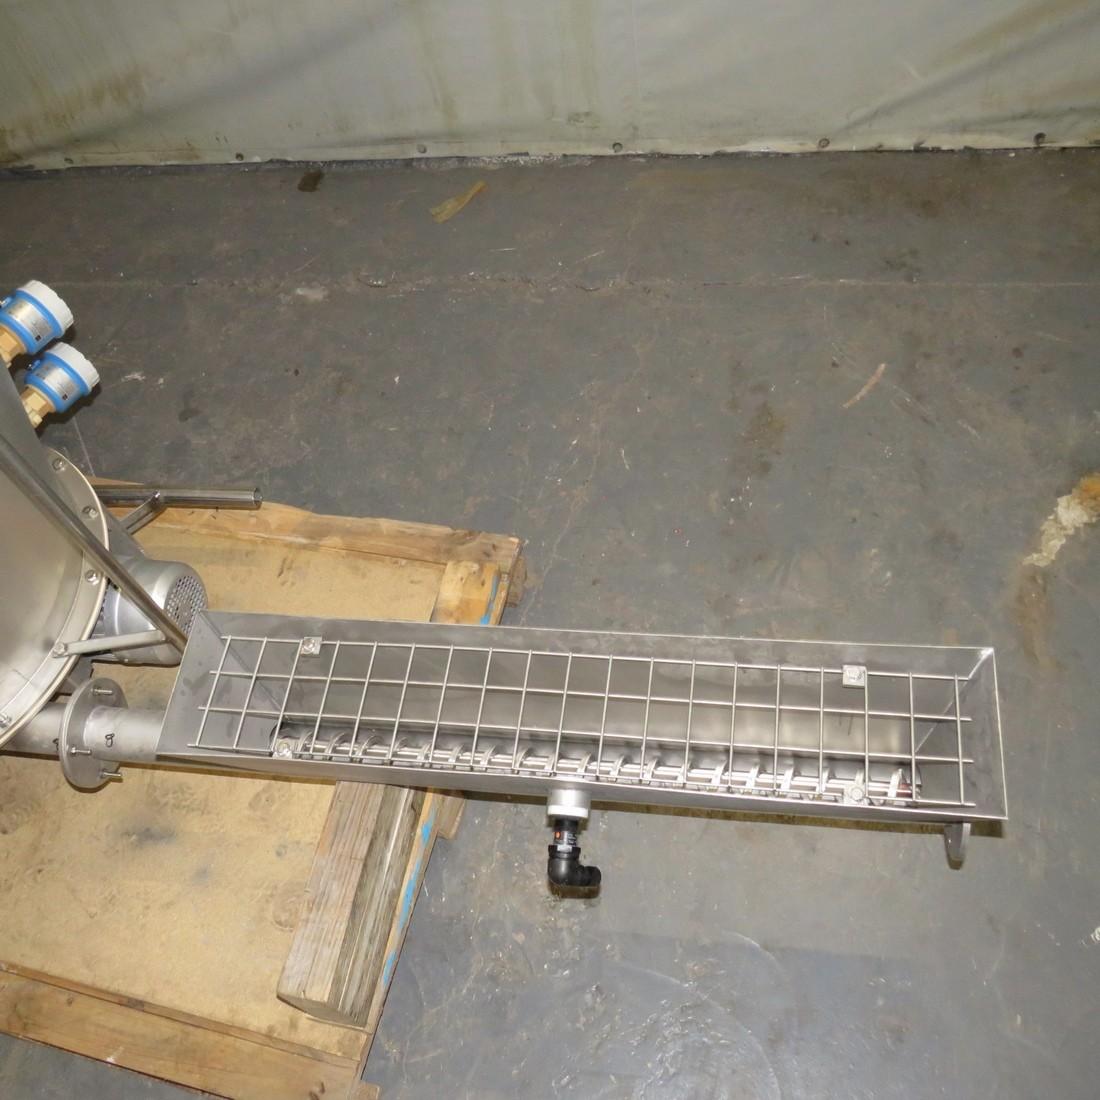 R11TB895 Stainless steel Transitube bag empty hooper - 180 liters